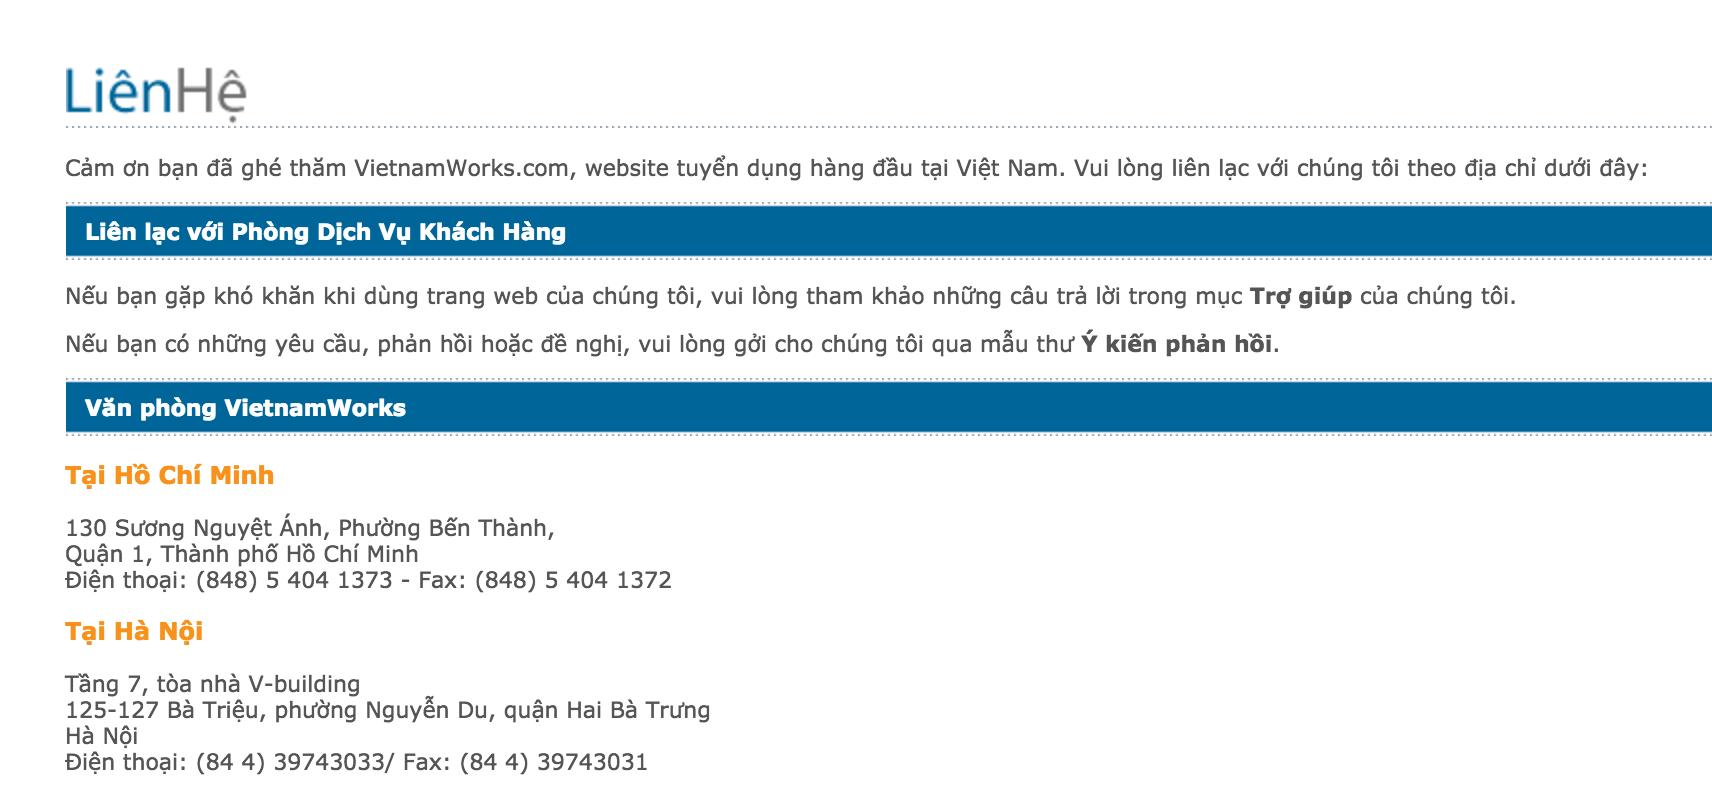 Liên hệ VietnamWorks